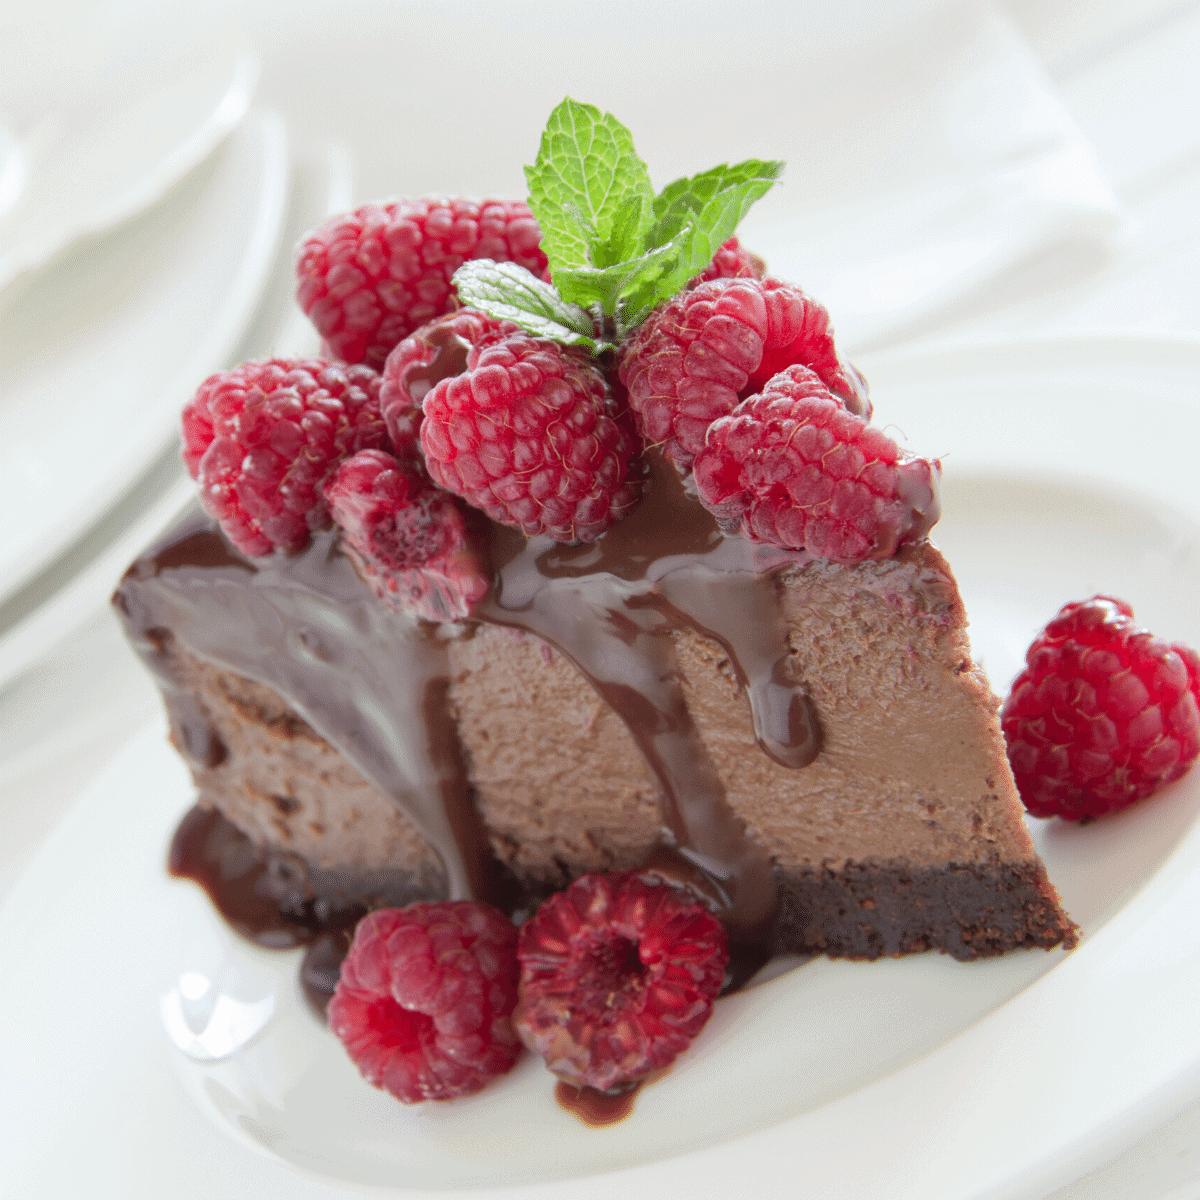 keto chocolate cheesecake recipe low carb gluten free dessert